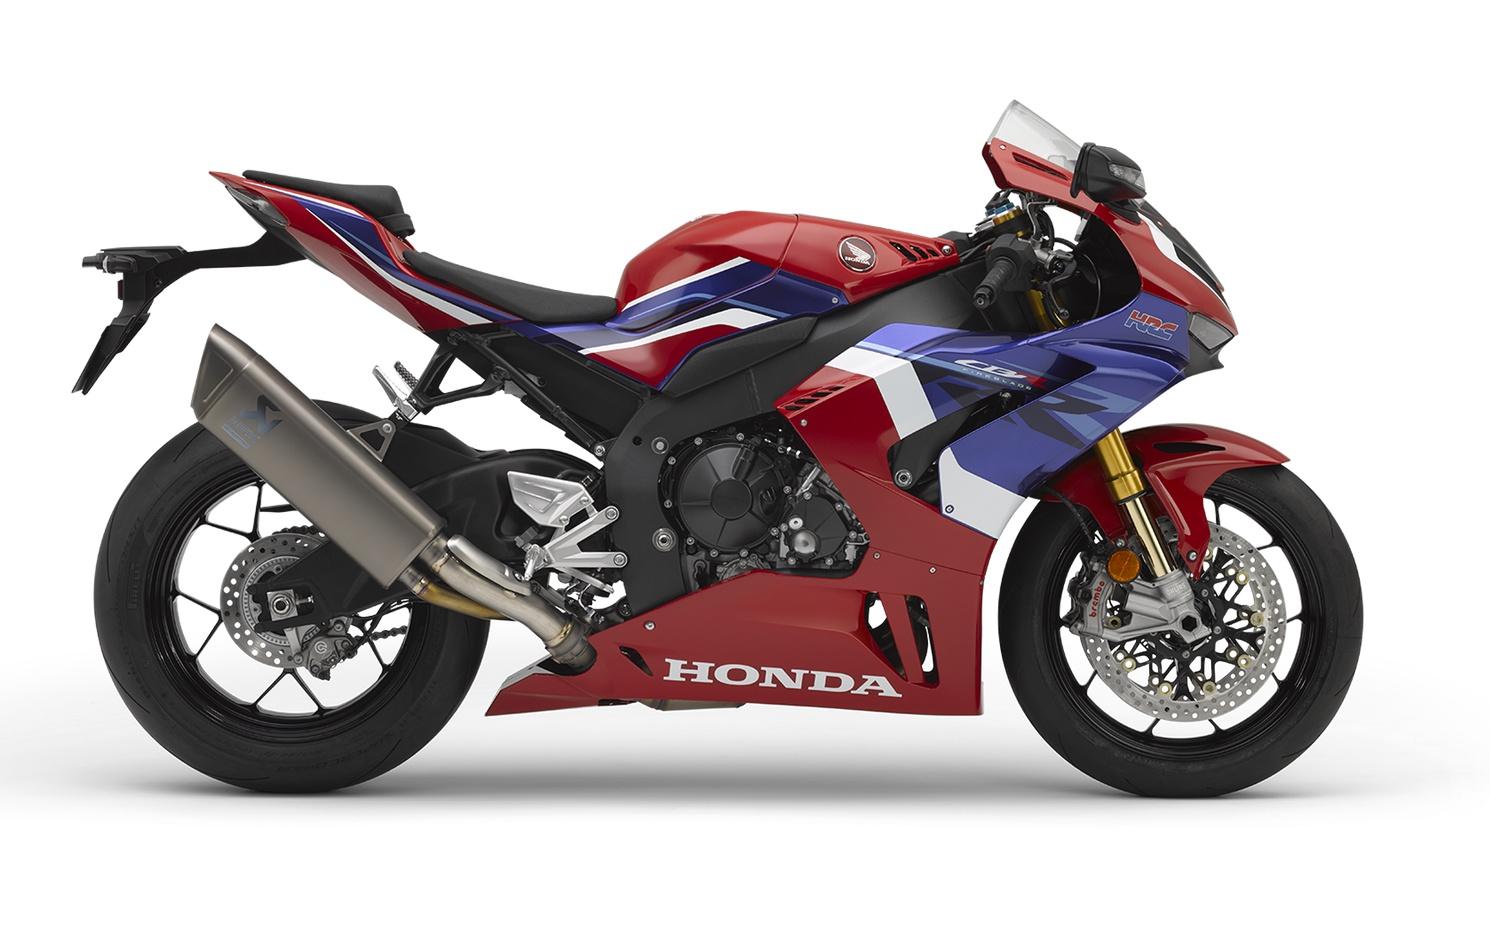 2021 Honda CBR1000RR-R FIREBLADE SP Ohlins, Brembo, Akropavic. Frais inclus+Taxes